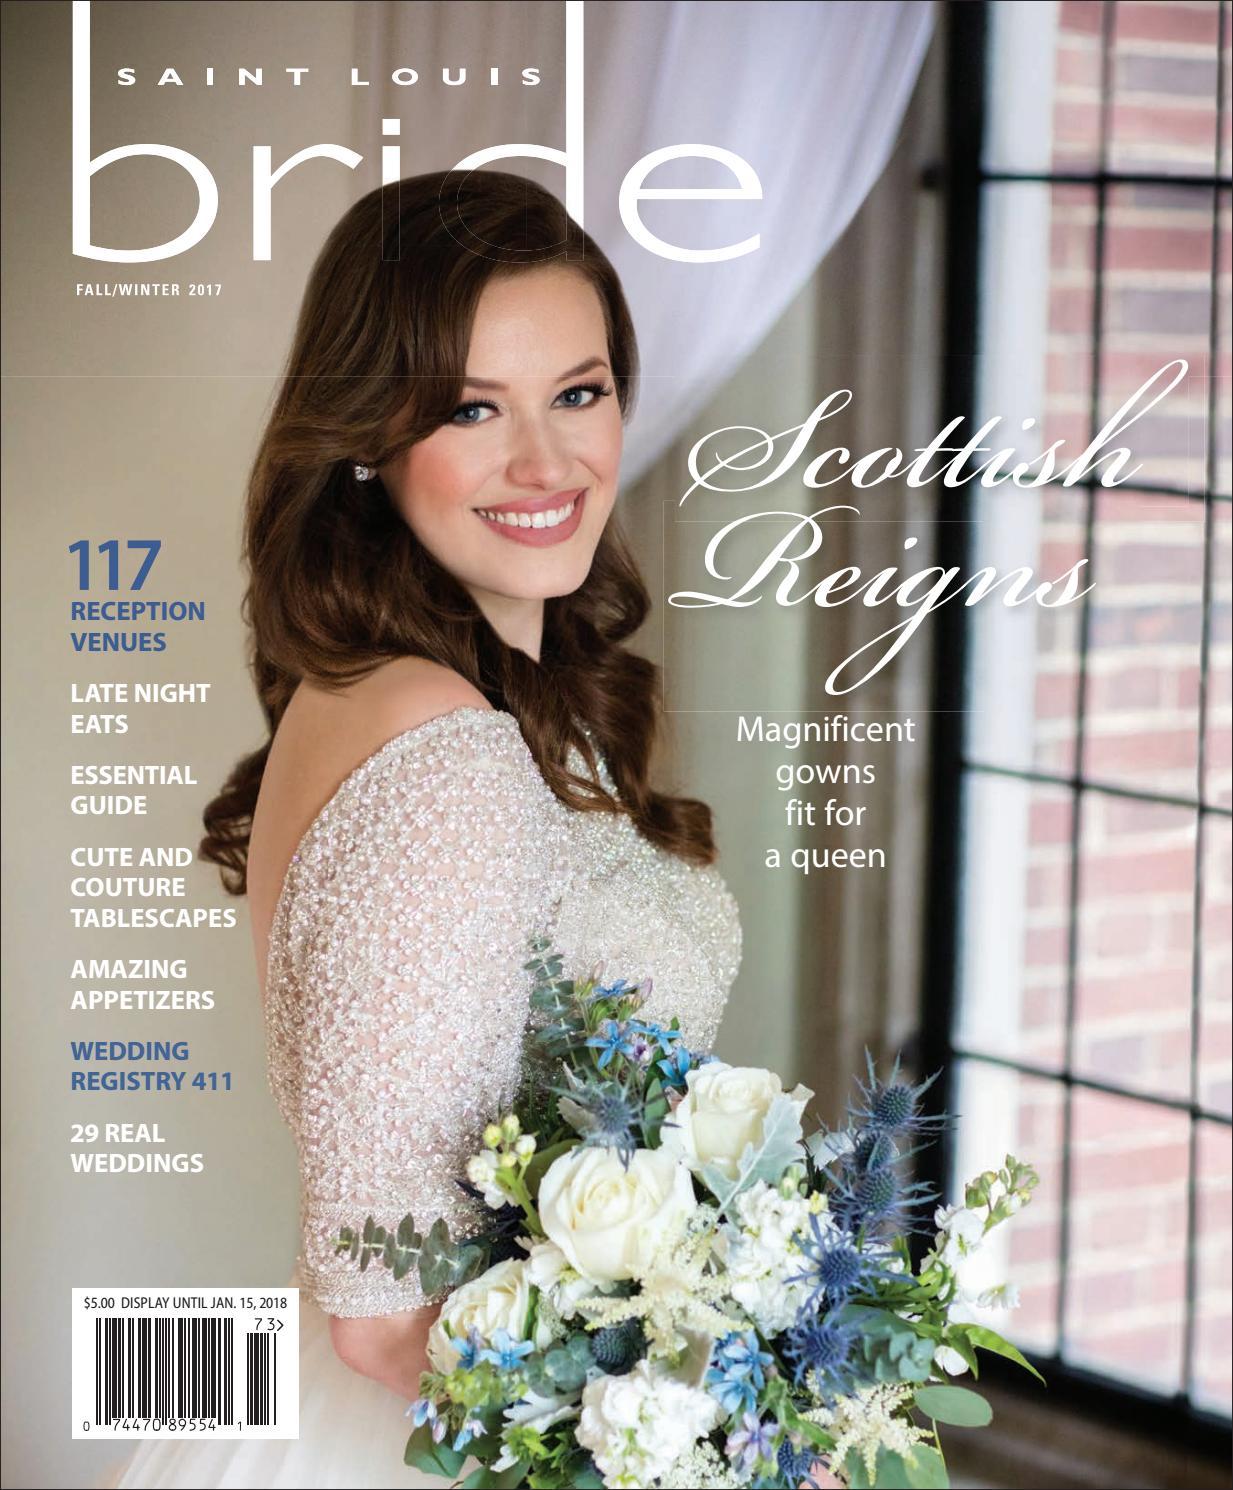 St. Louis Bride Fall-Winter 2017 by Morris Media Network - issuu